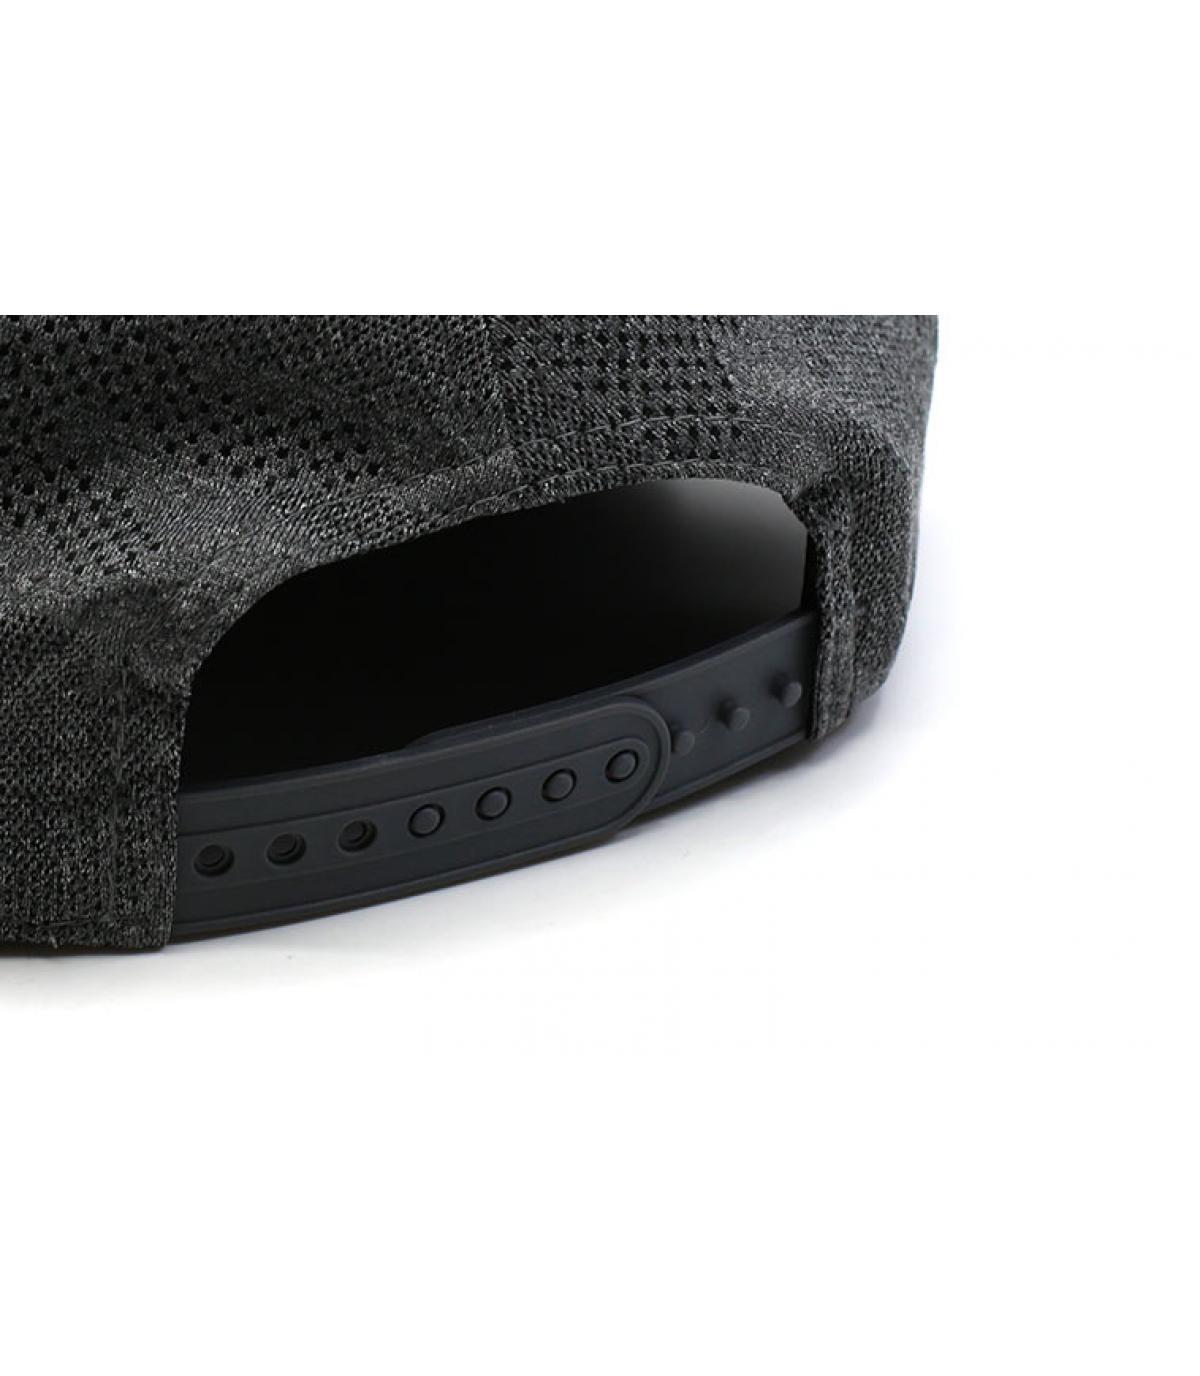 Details Snapback Engineered Plus NY 950 gray black - Abbildung 5